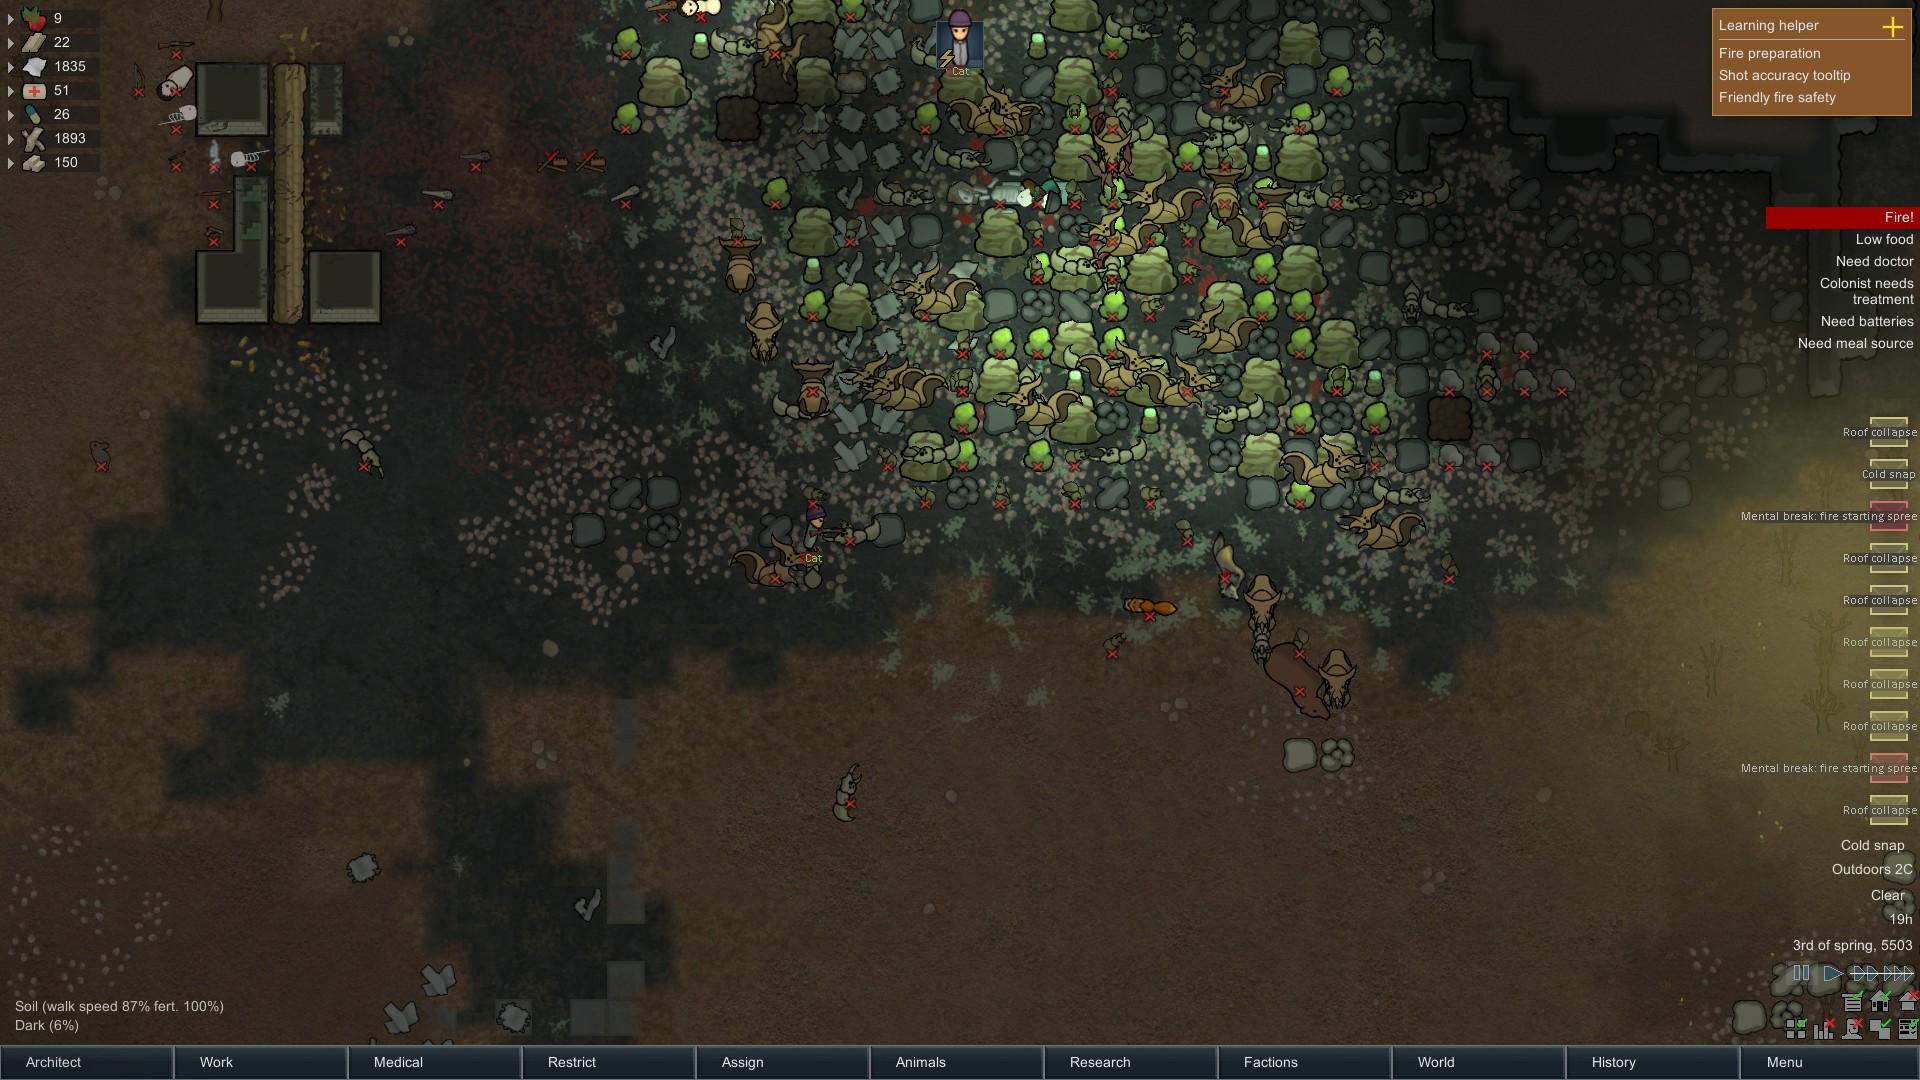 Steam Community :: Guide :: Beyond The Basics: Rimworld Survival Guide